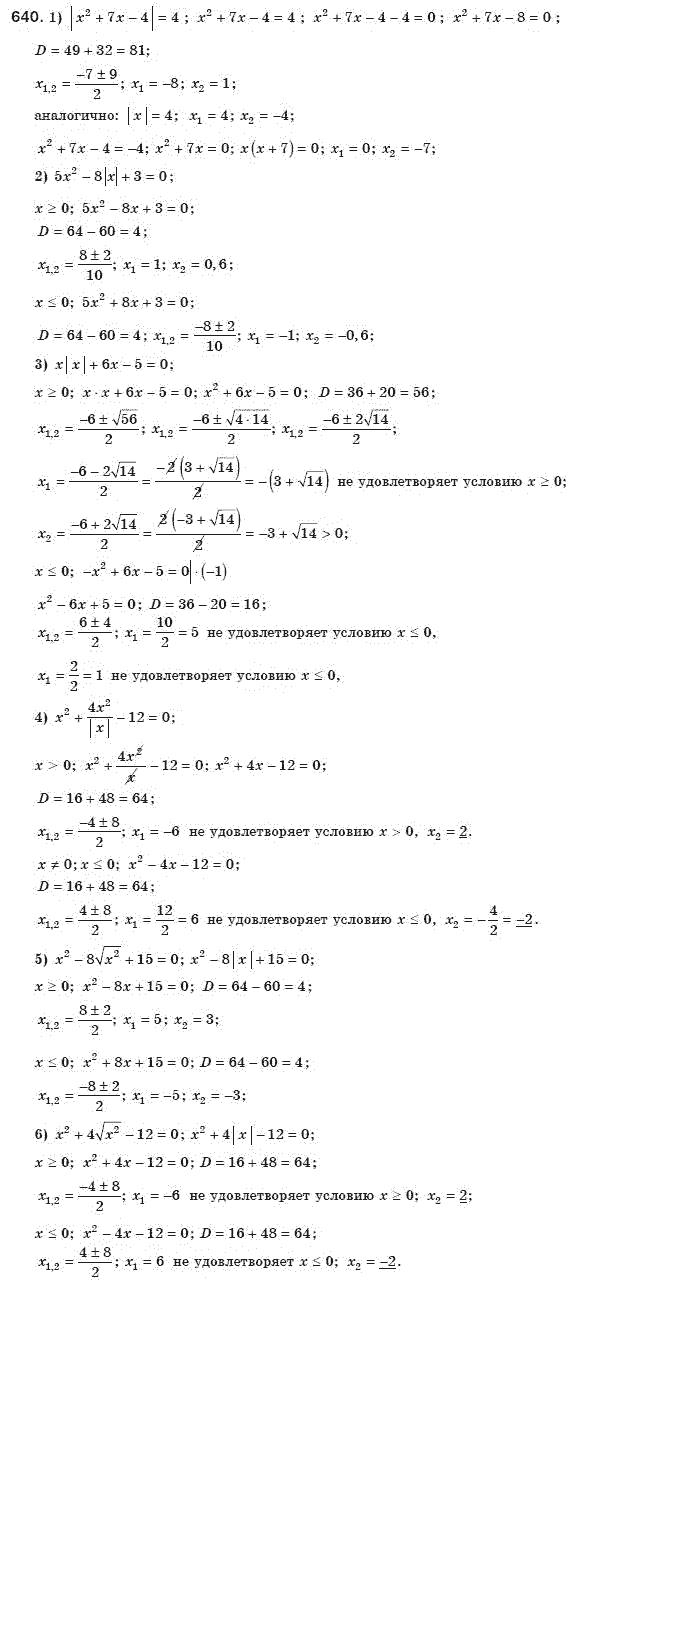 якир алгебра мерзляк решебник полонский